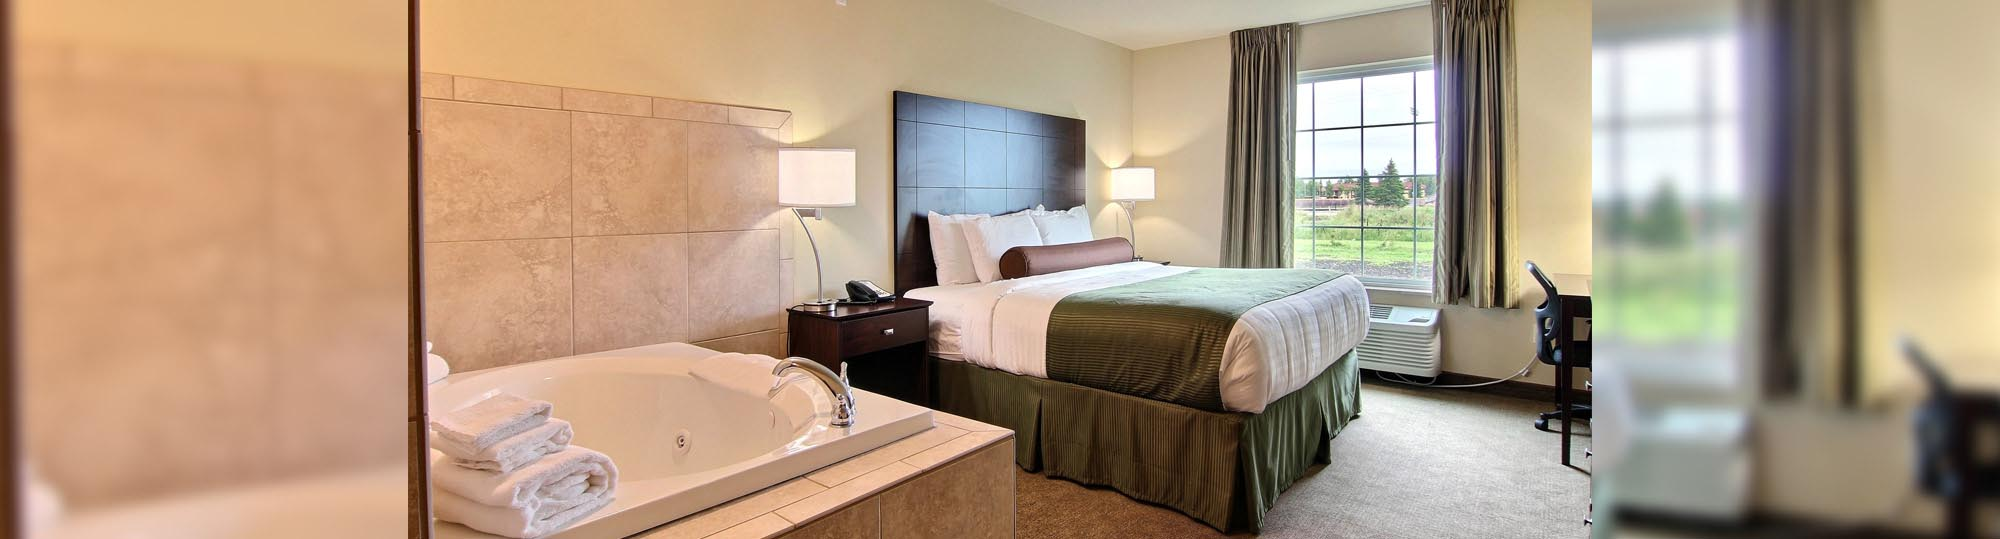 Cobblestone Hotel and Suites Crookston